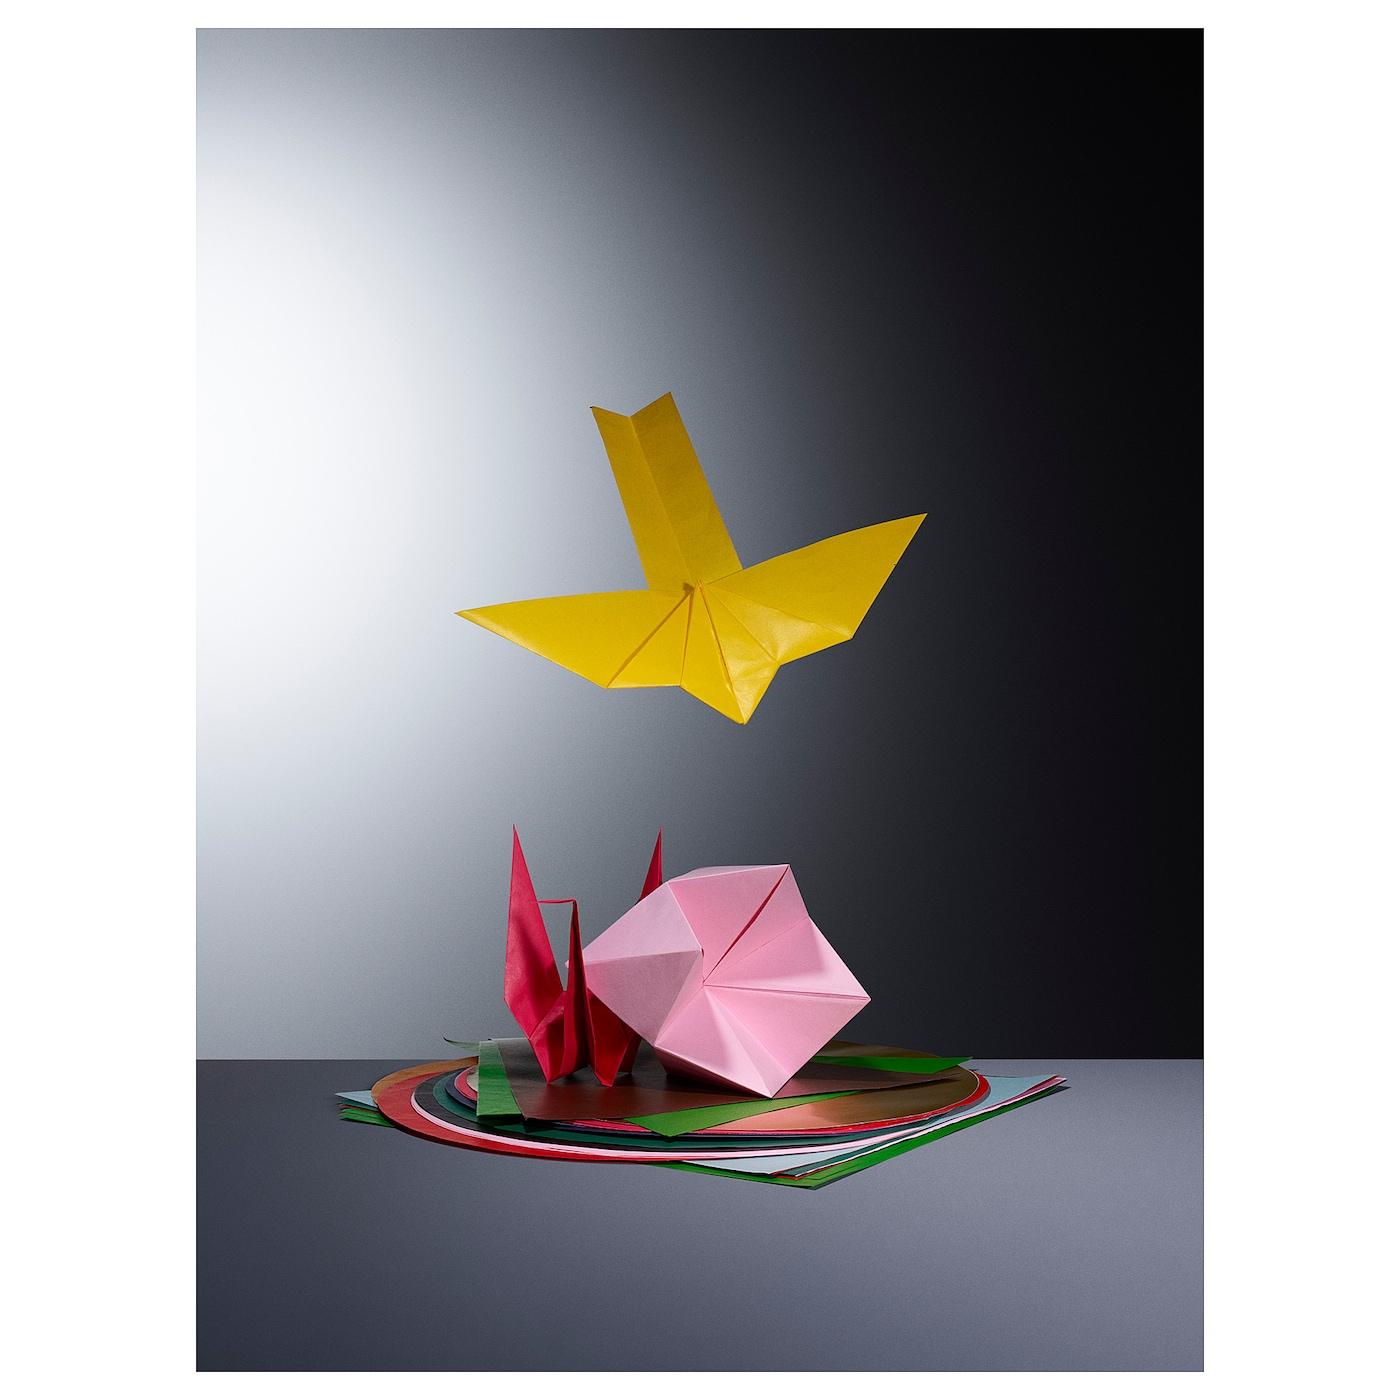 Lustigt Origami Paper Mixed Colours Shapes Ikea Bird Box Diagram Diagrams Pinterest